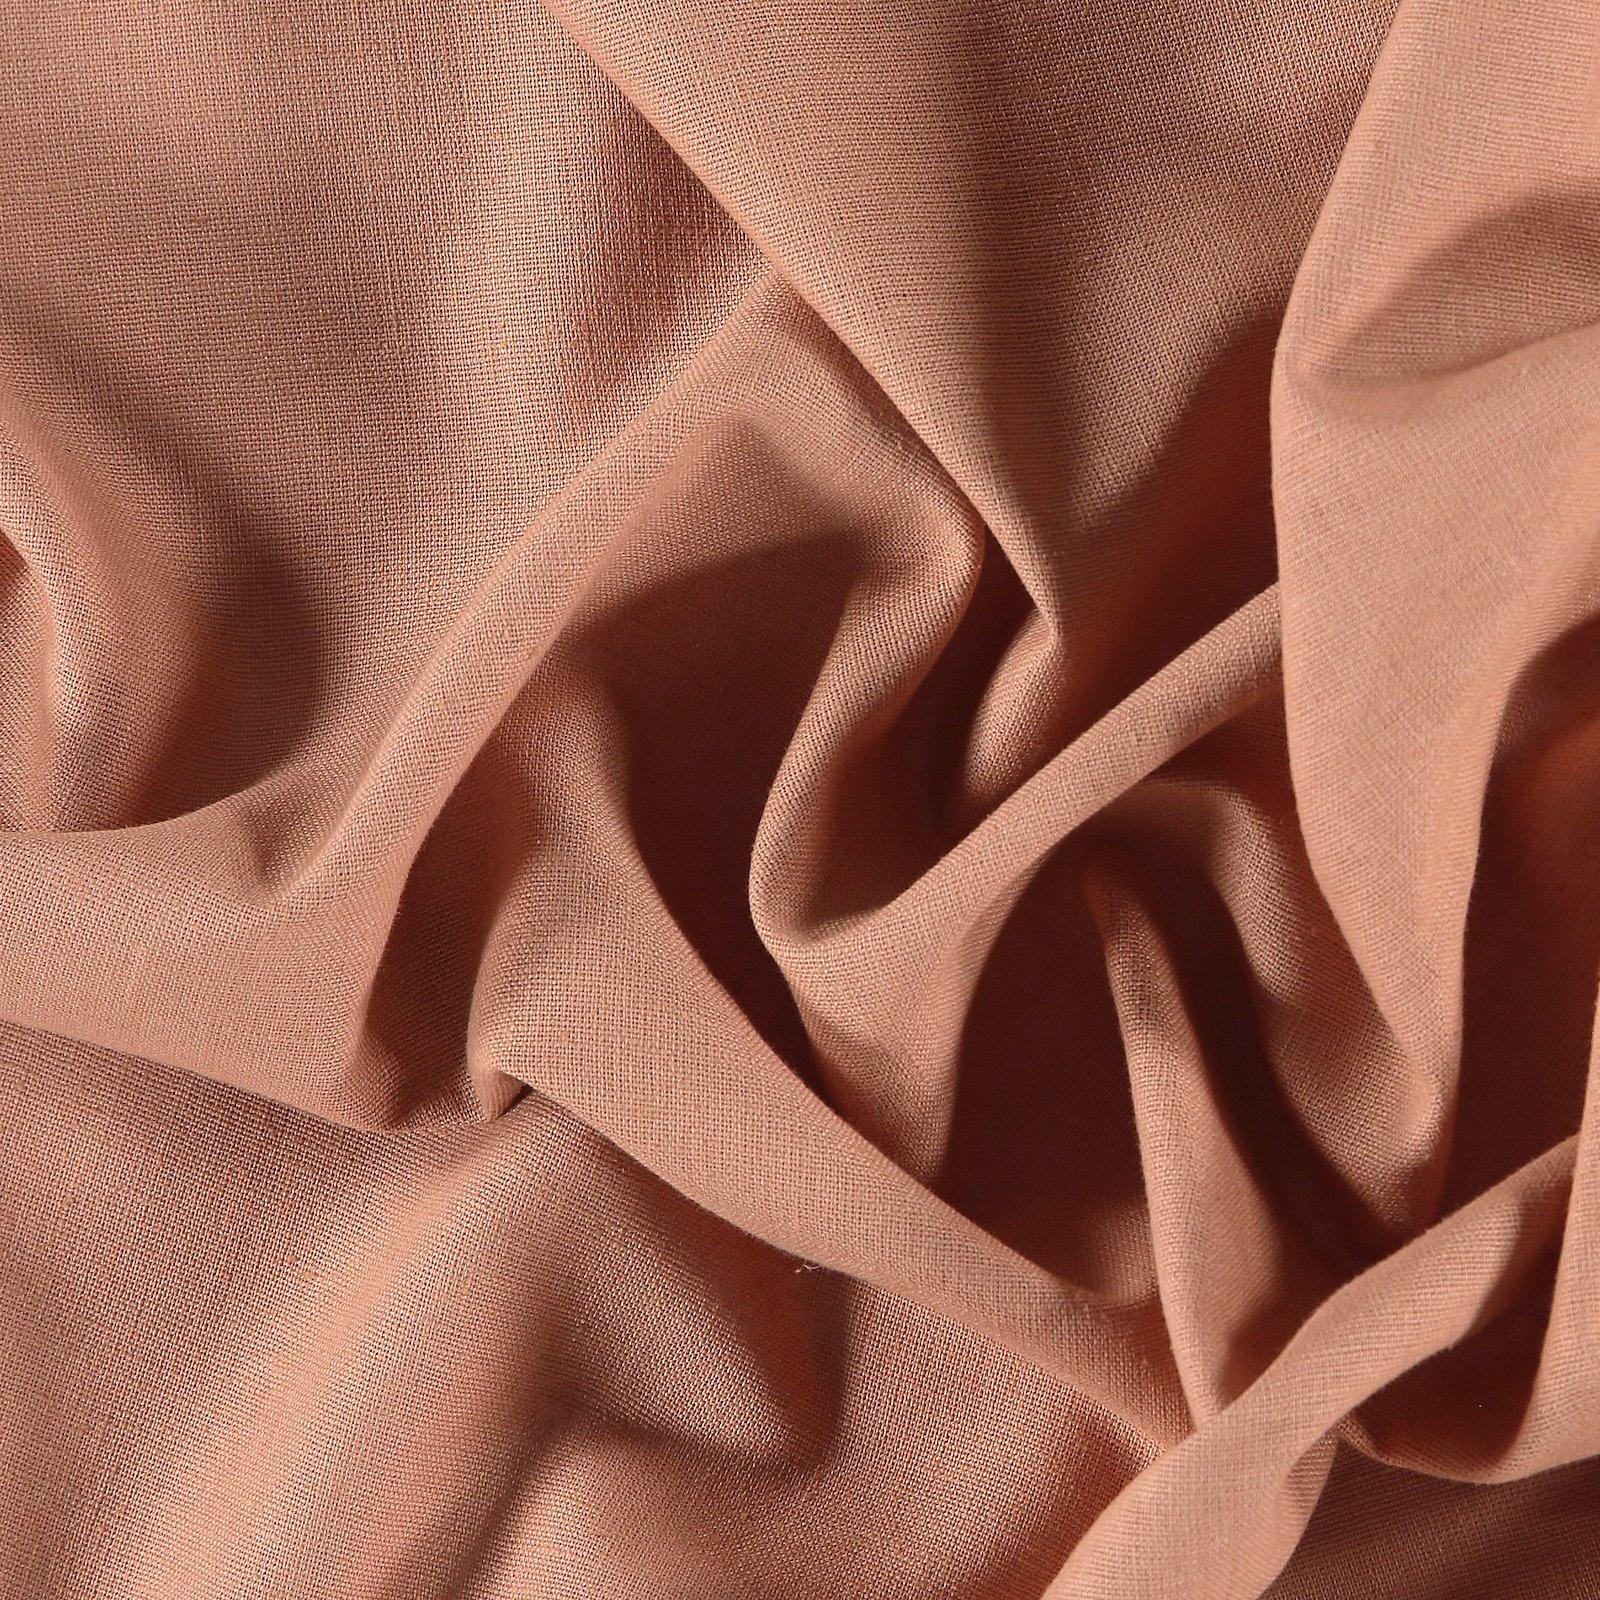 Linen/cotton light terracotta 410132_pack